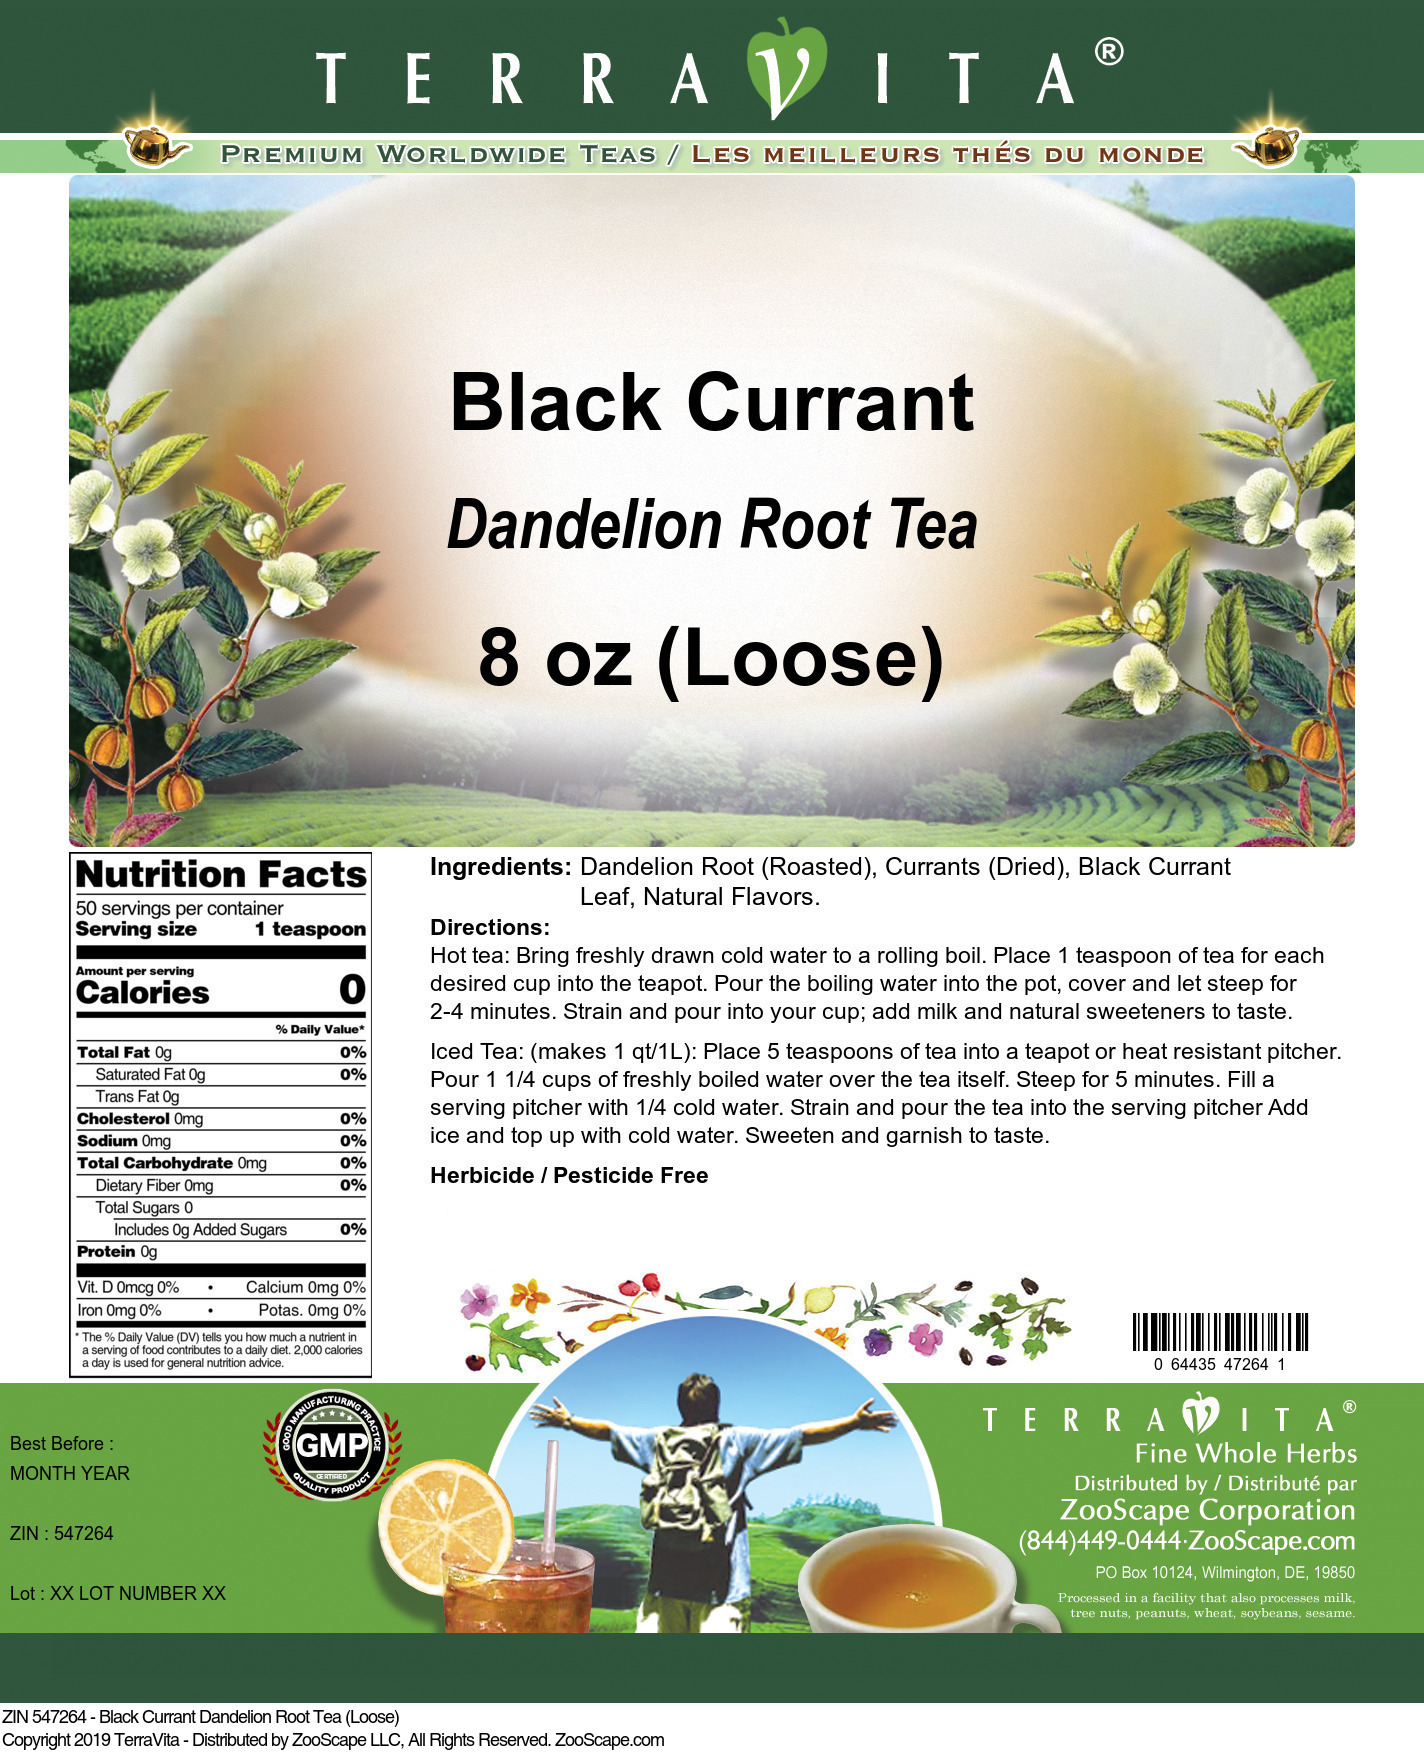 Black Currant Dandelion Root